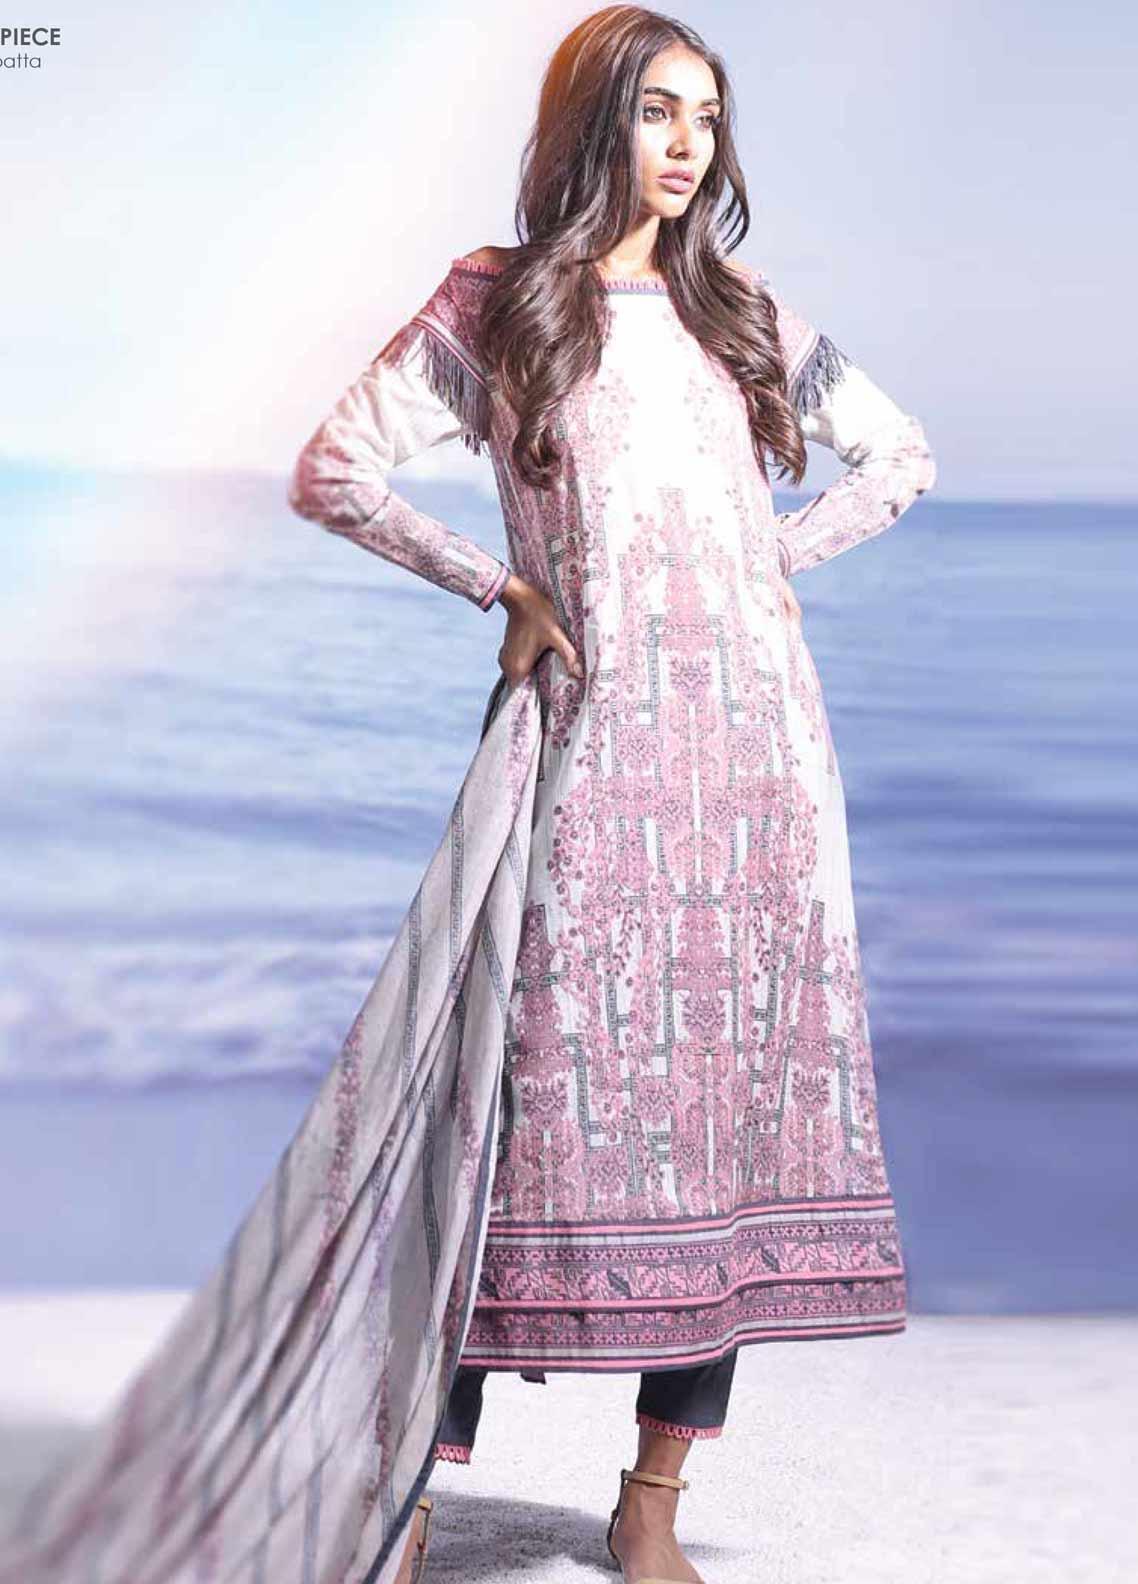 2 Piece Al-Amira Hijab White Shop at Discount Price